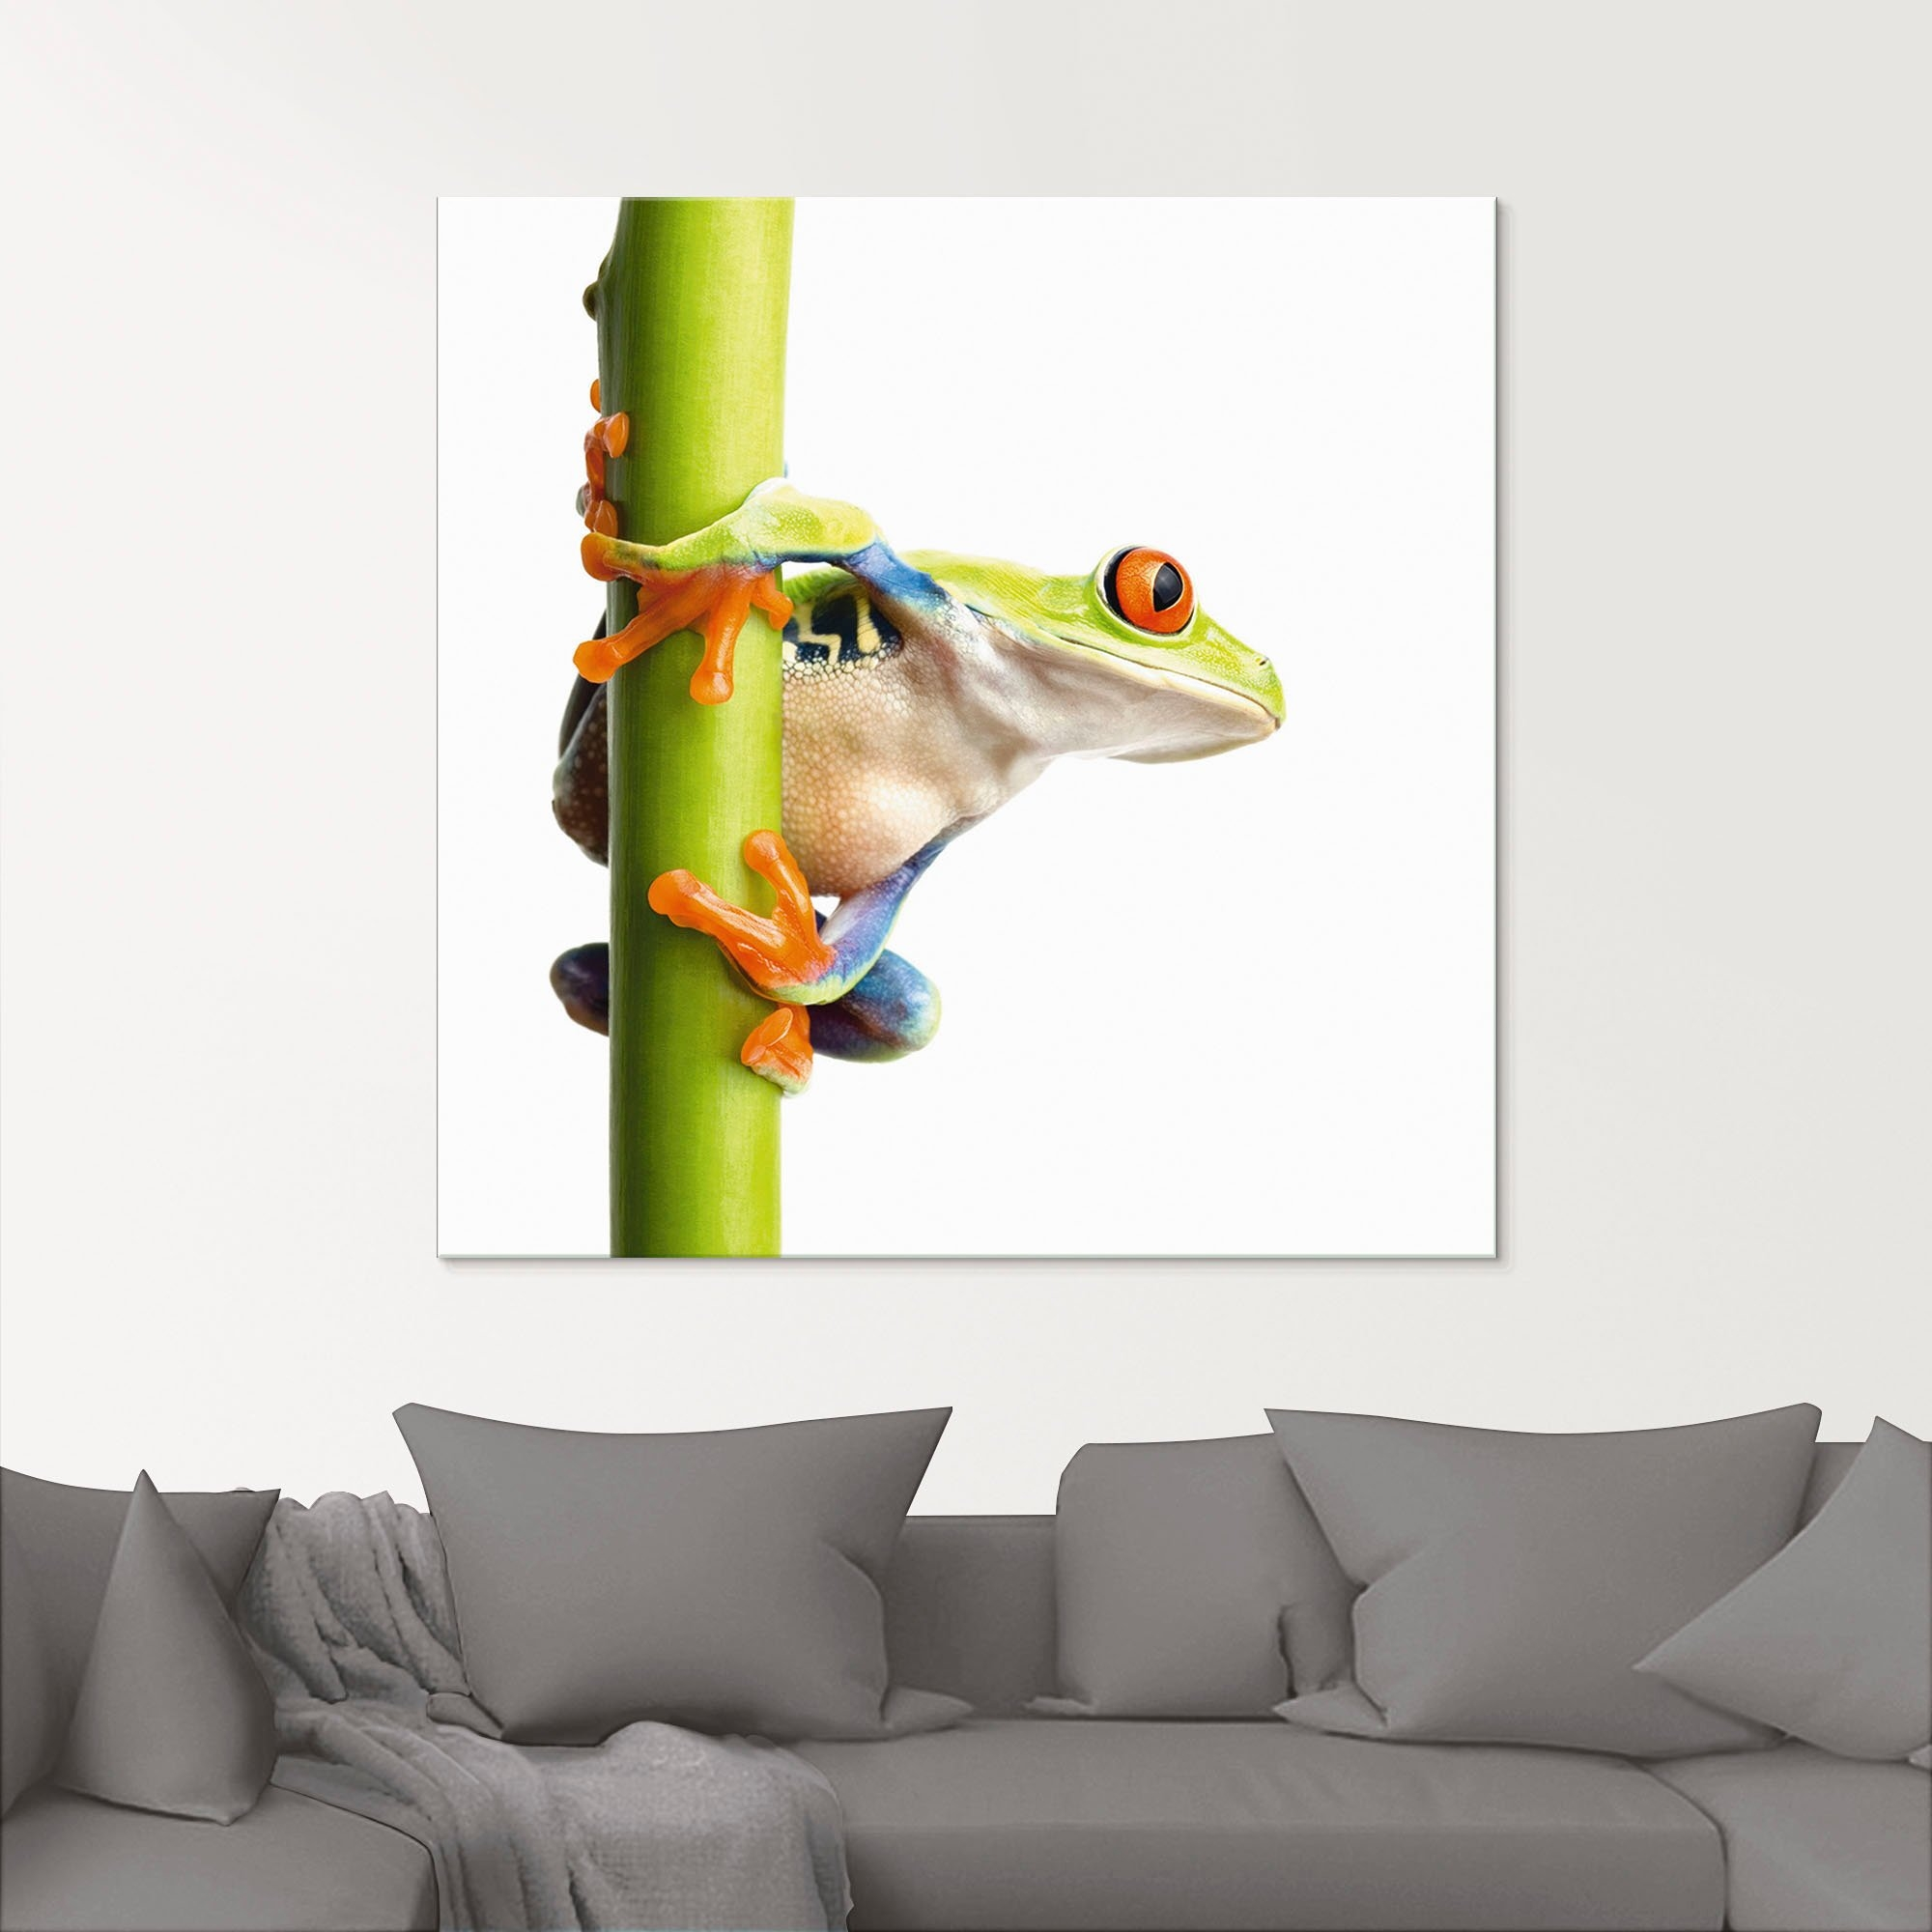 Artland print op glas »Frosch umfasst einen Pflanzenstengel« online kopen op otto.nl